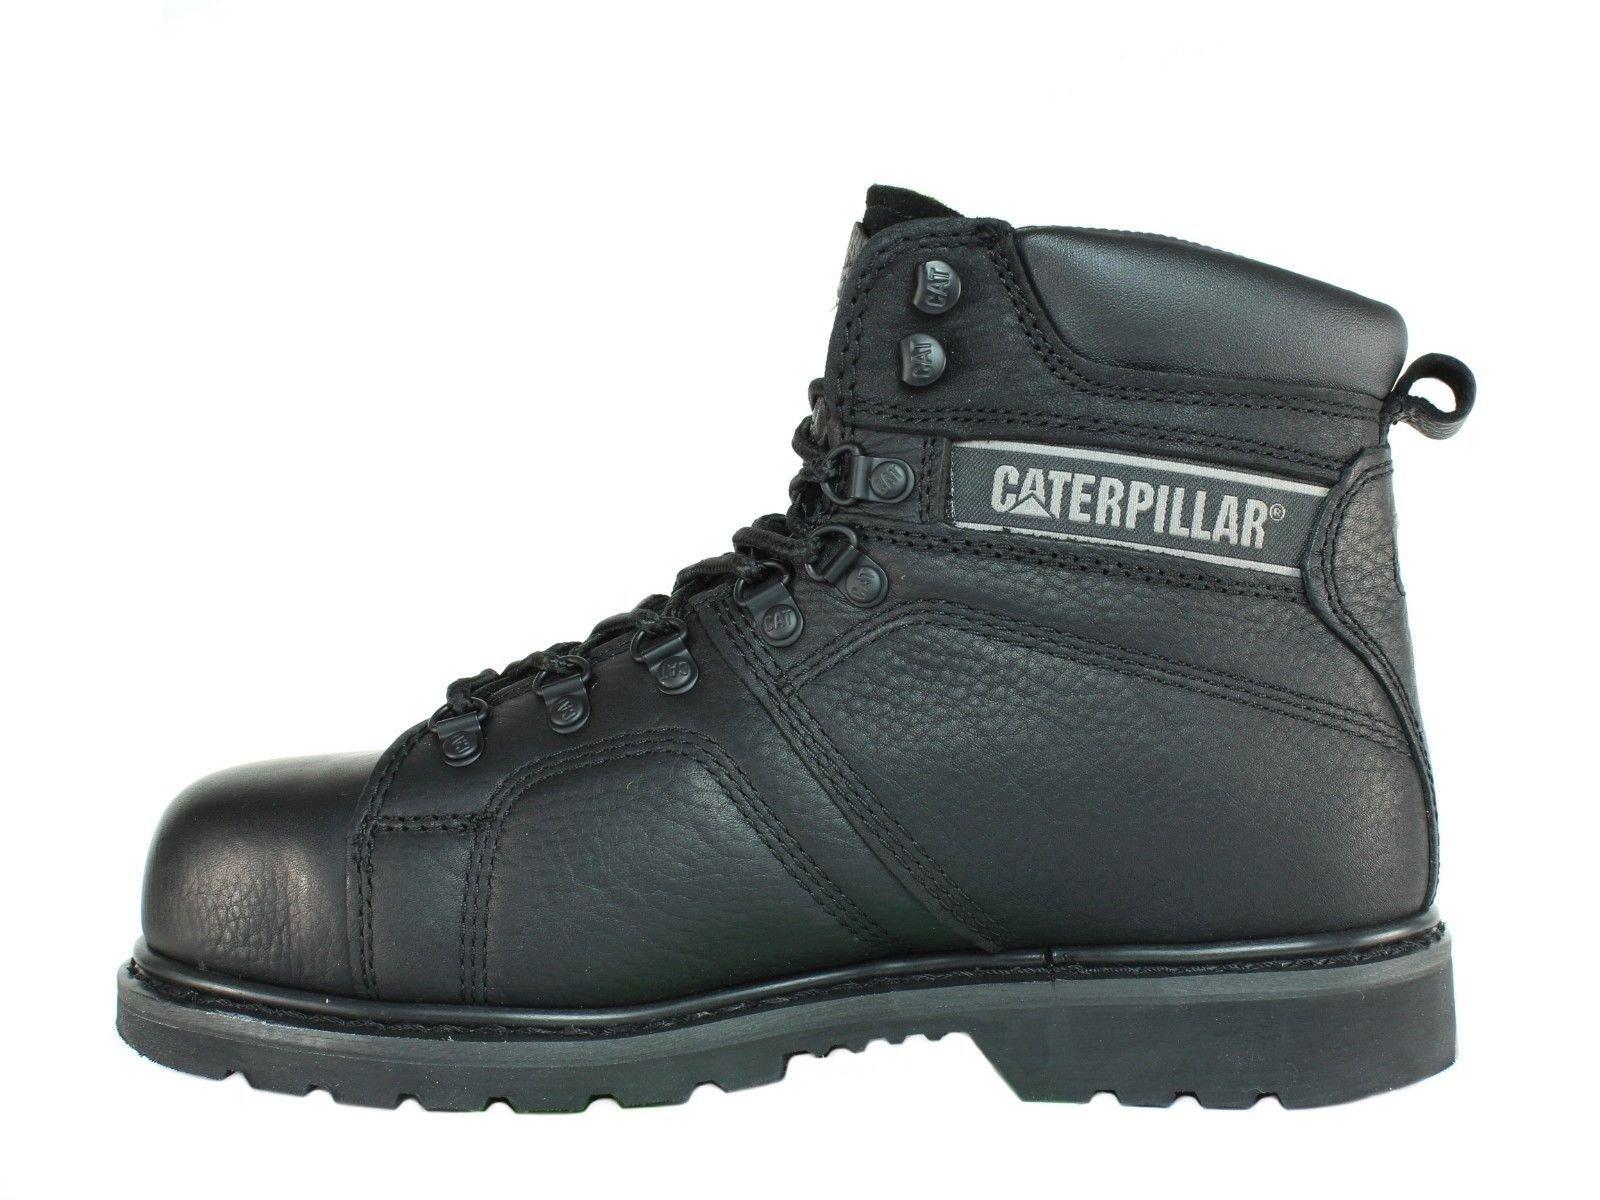 Caterpillar SureGrip Mens Silverton SG Black Slip Resistant Work Boots 12M by Caterpillar (Image #6)